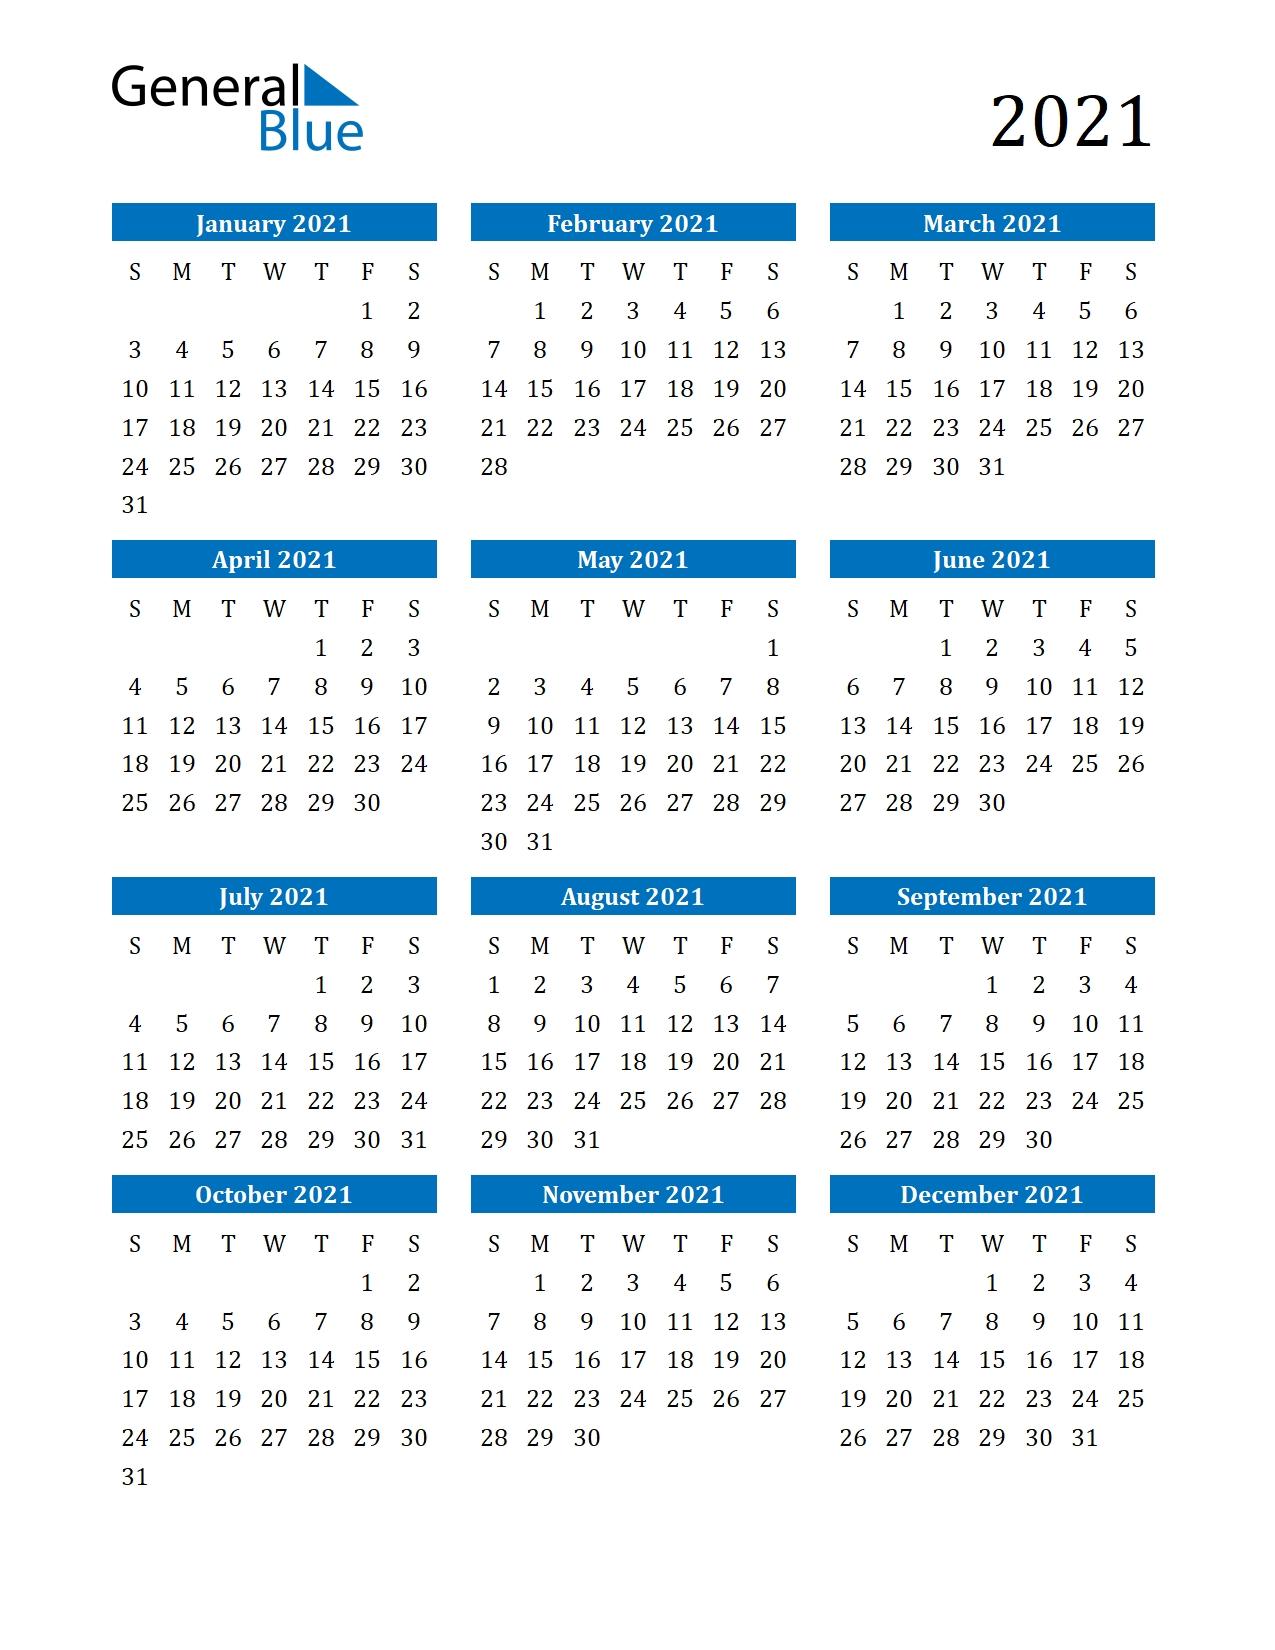 Collect 2021 Work Week Calendar Printable